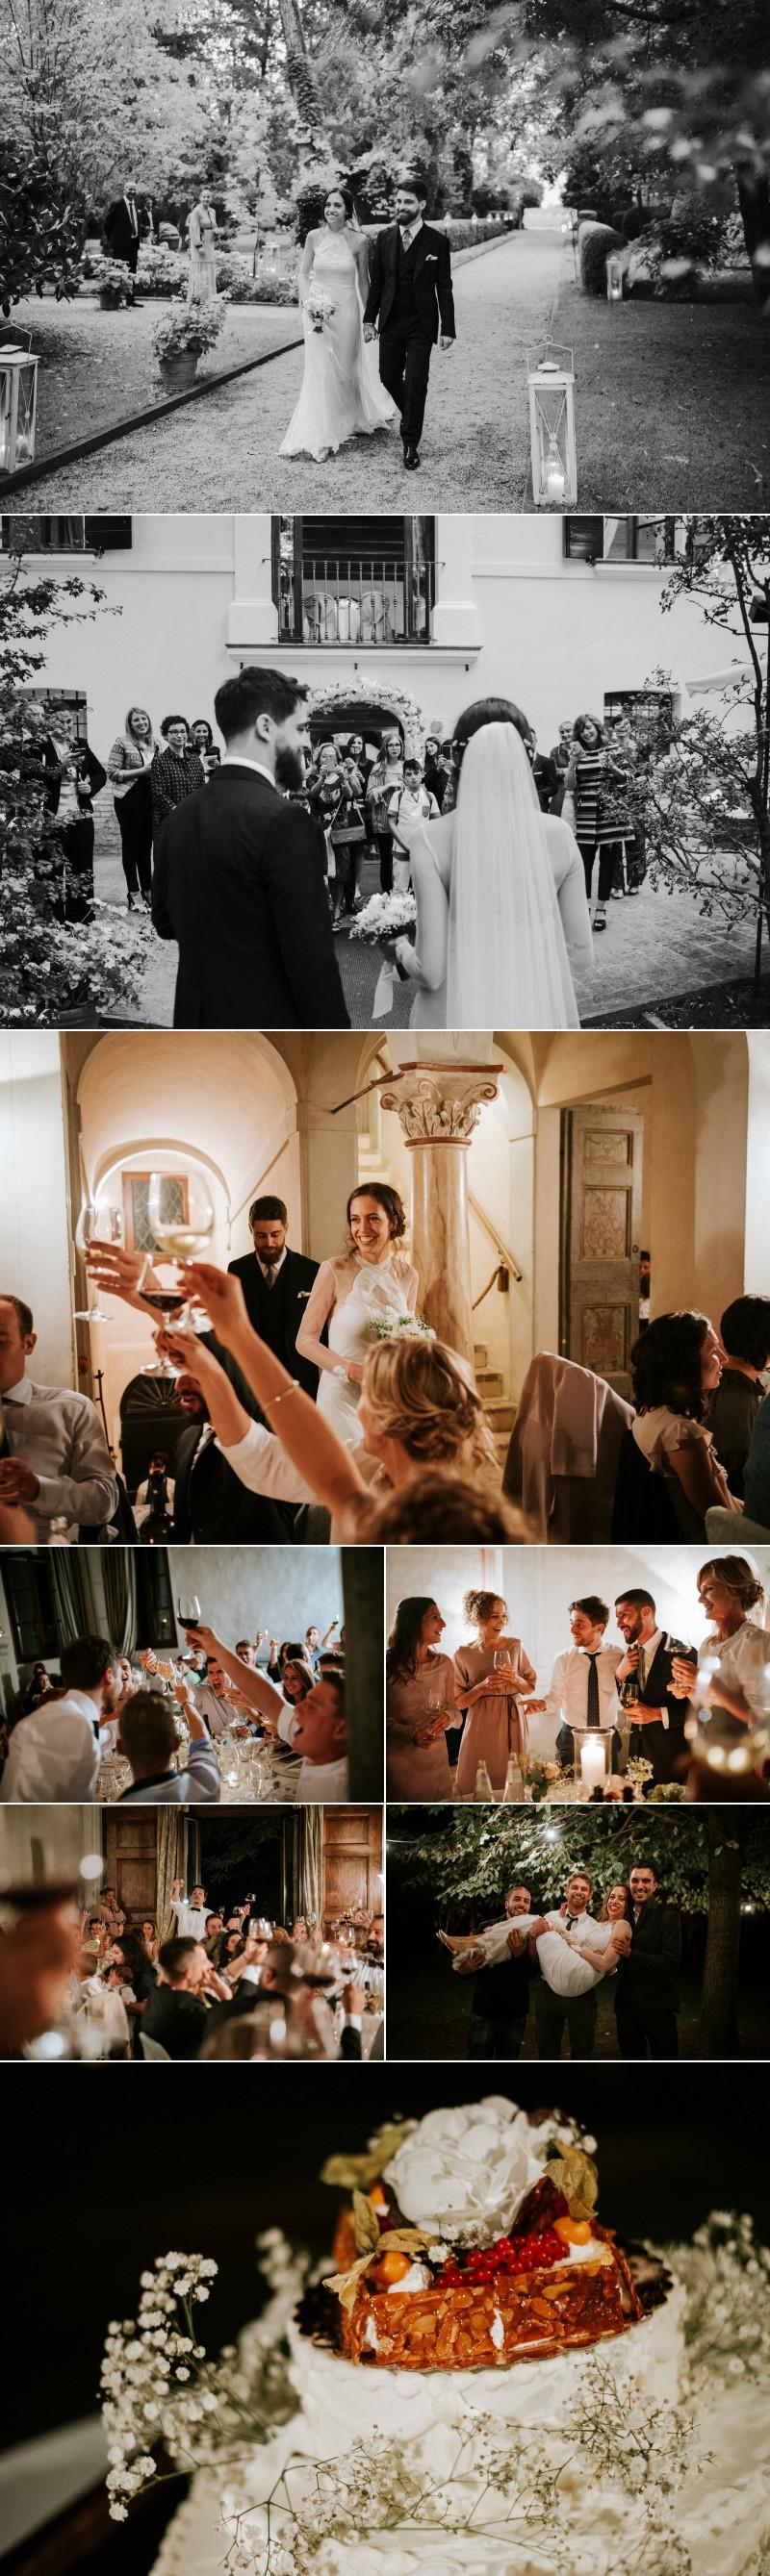 Bologna Ravenna Destination Wedding Photographer 10